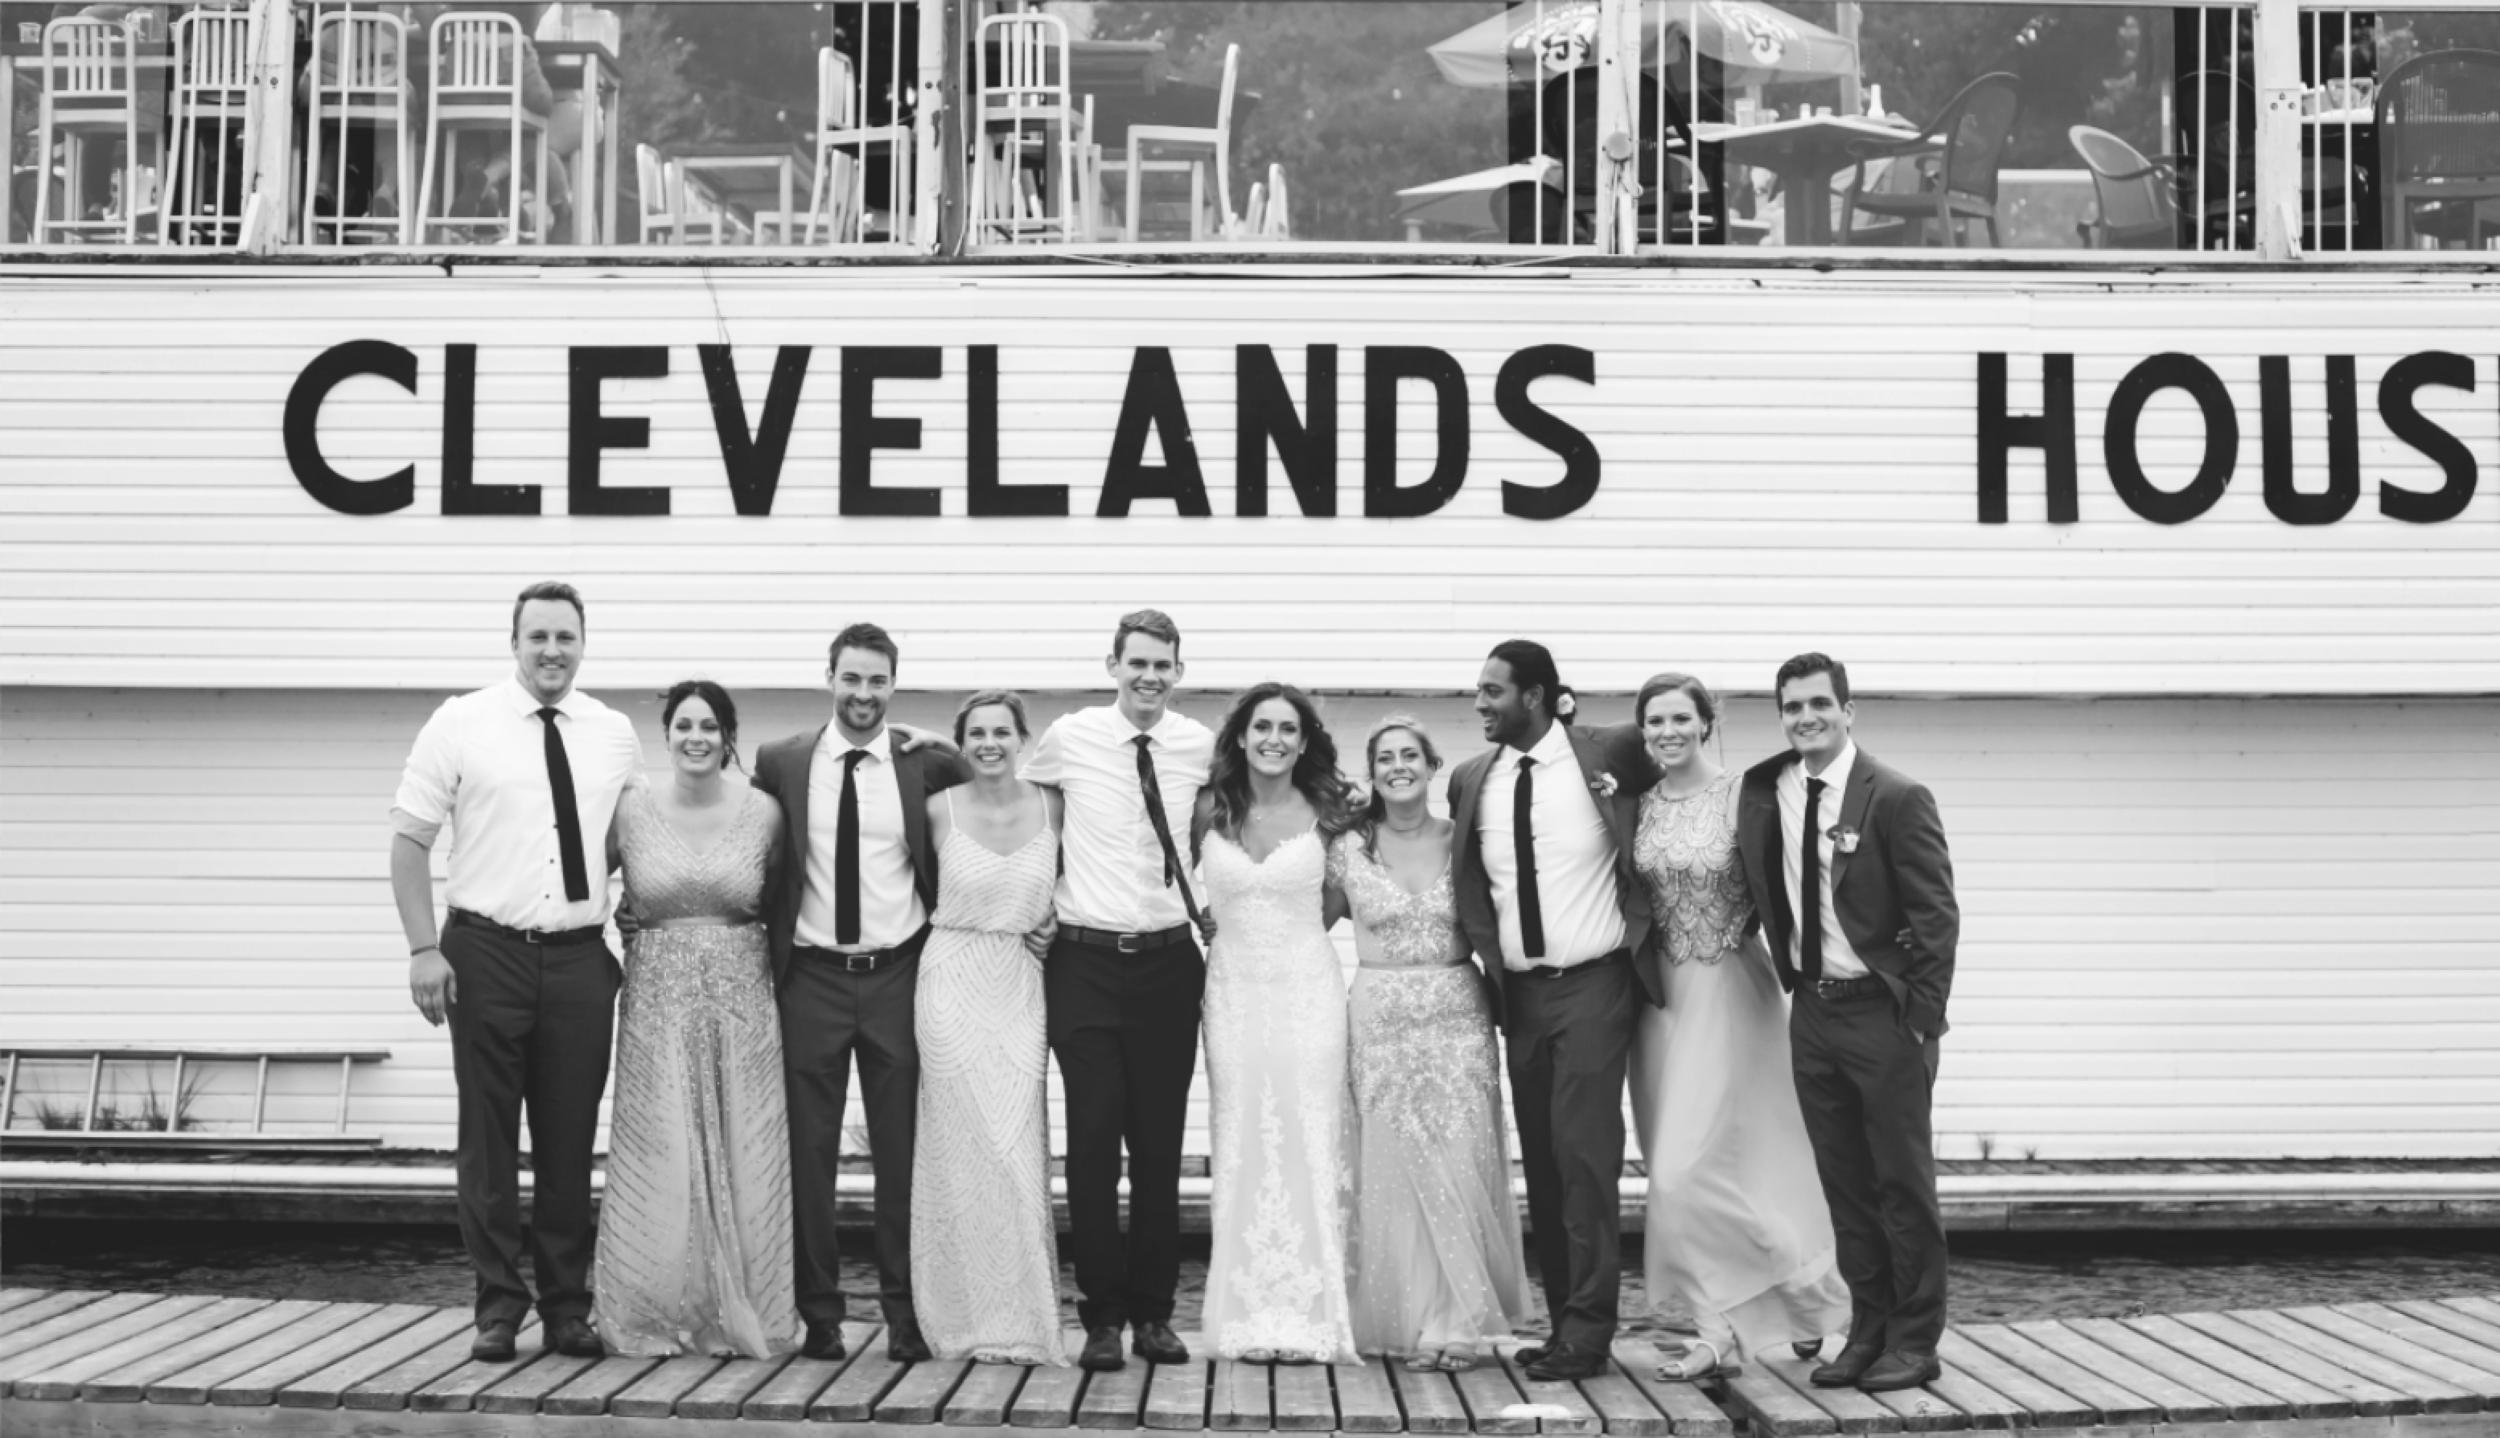 Wedding-Photos-Muskoka-Clevelands-House-Photographer-Wedding-Hamilton-GTA-Niagara-Oakville-Moments-by-Lauren-Photography-Photo-Image-93.png